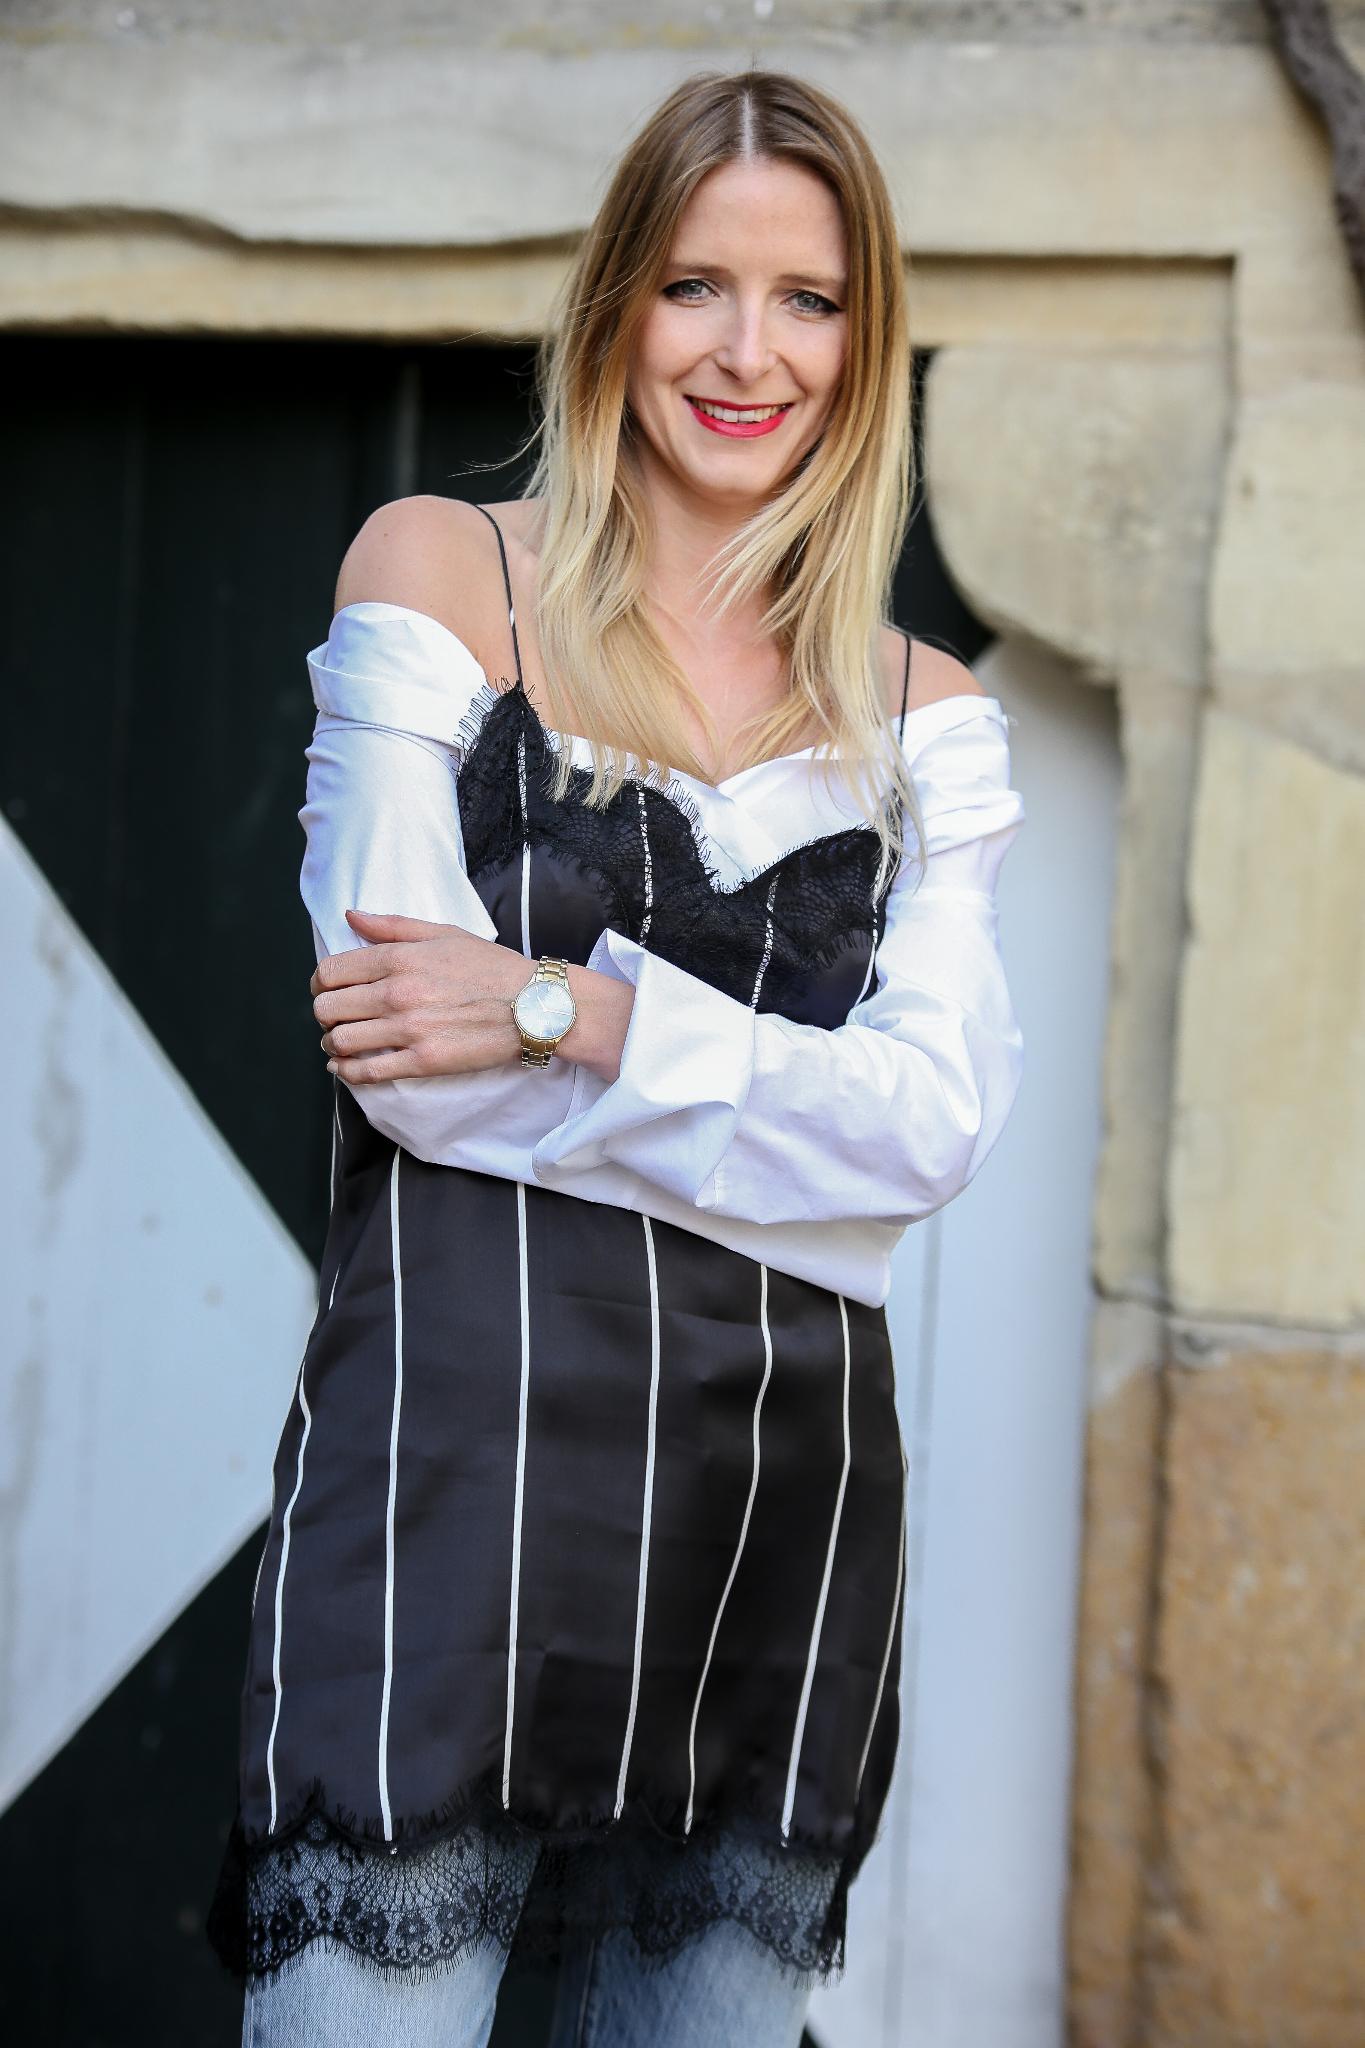 Fashion_Outfit_Off_Shoulder_Striped_Slipdress_MOD - by Monique-4